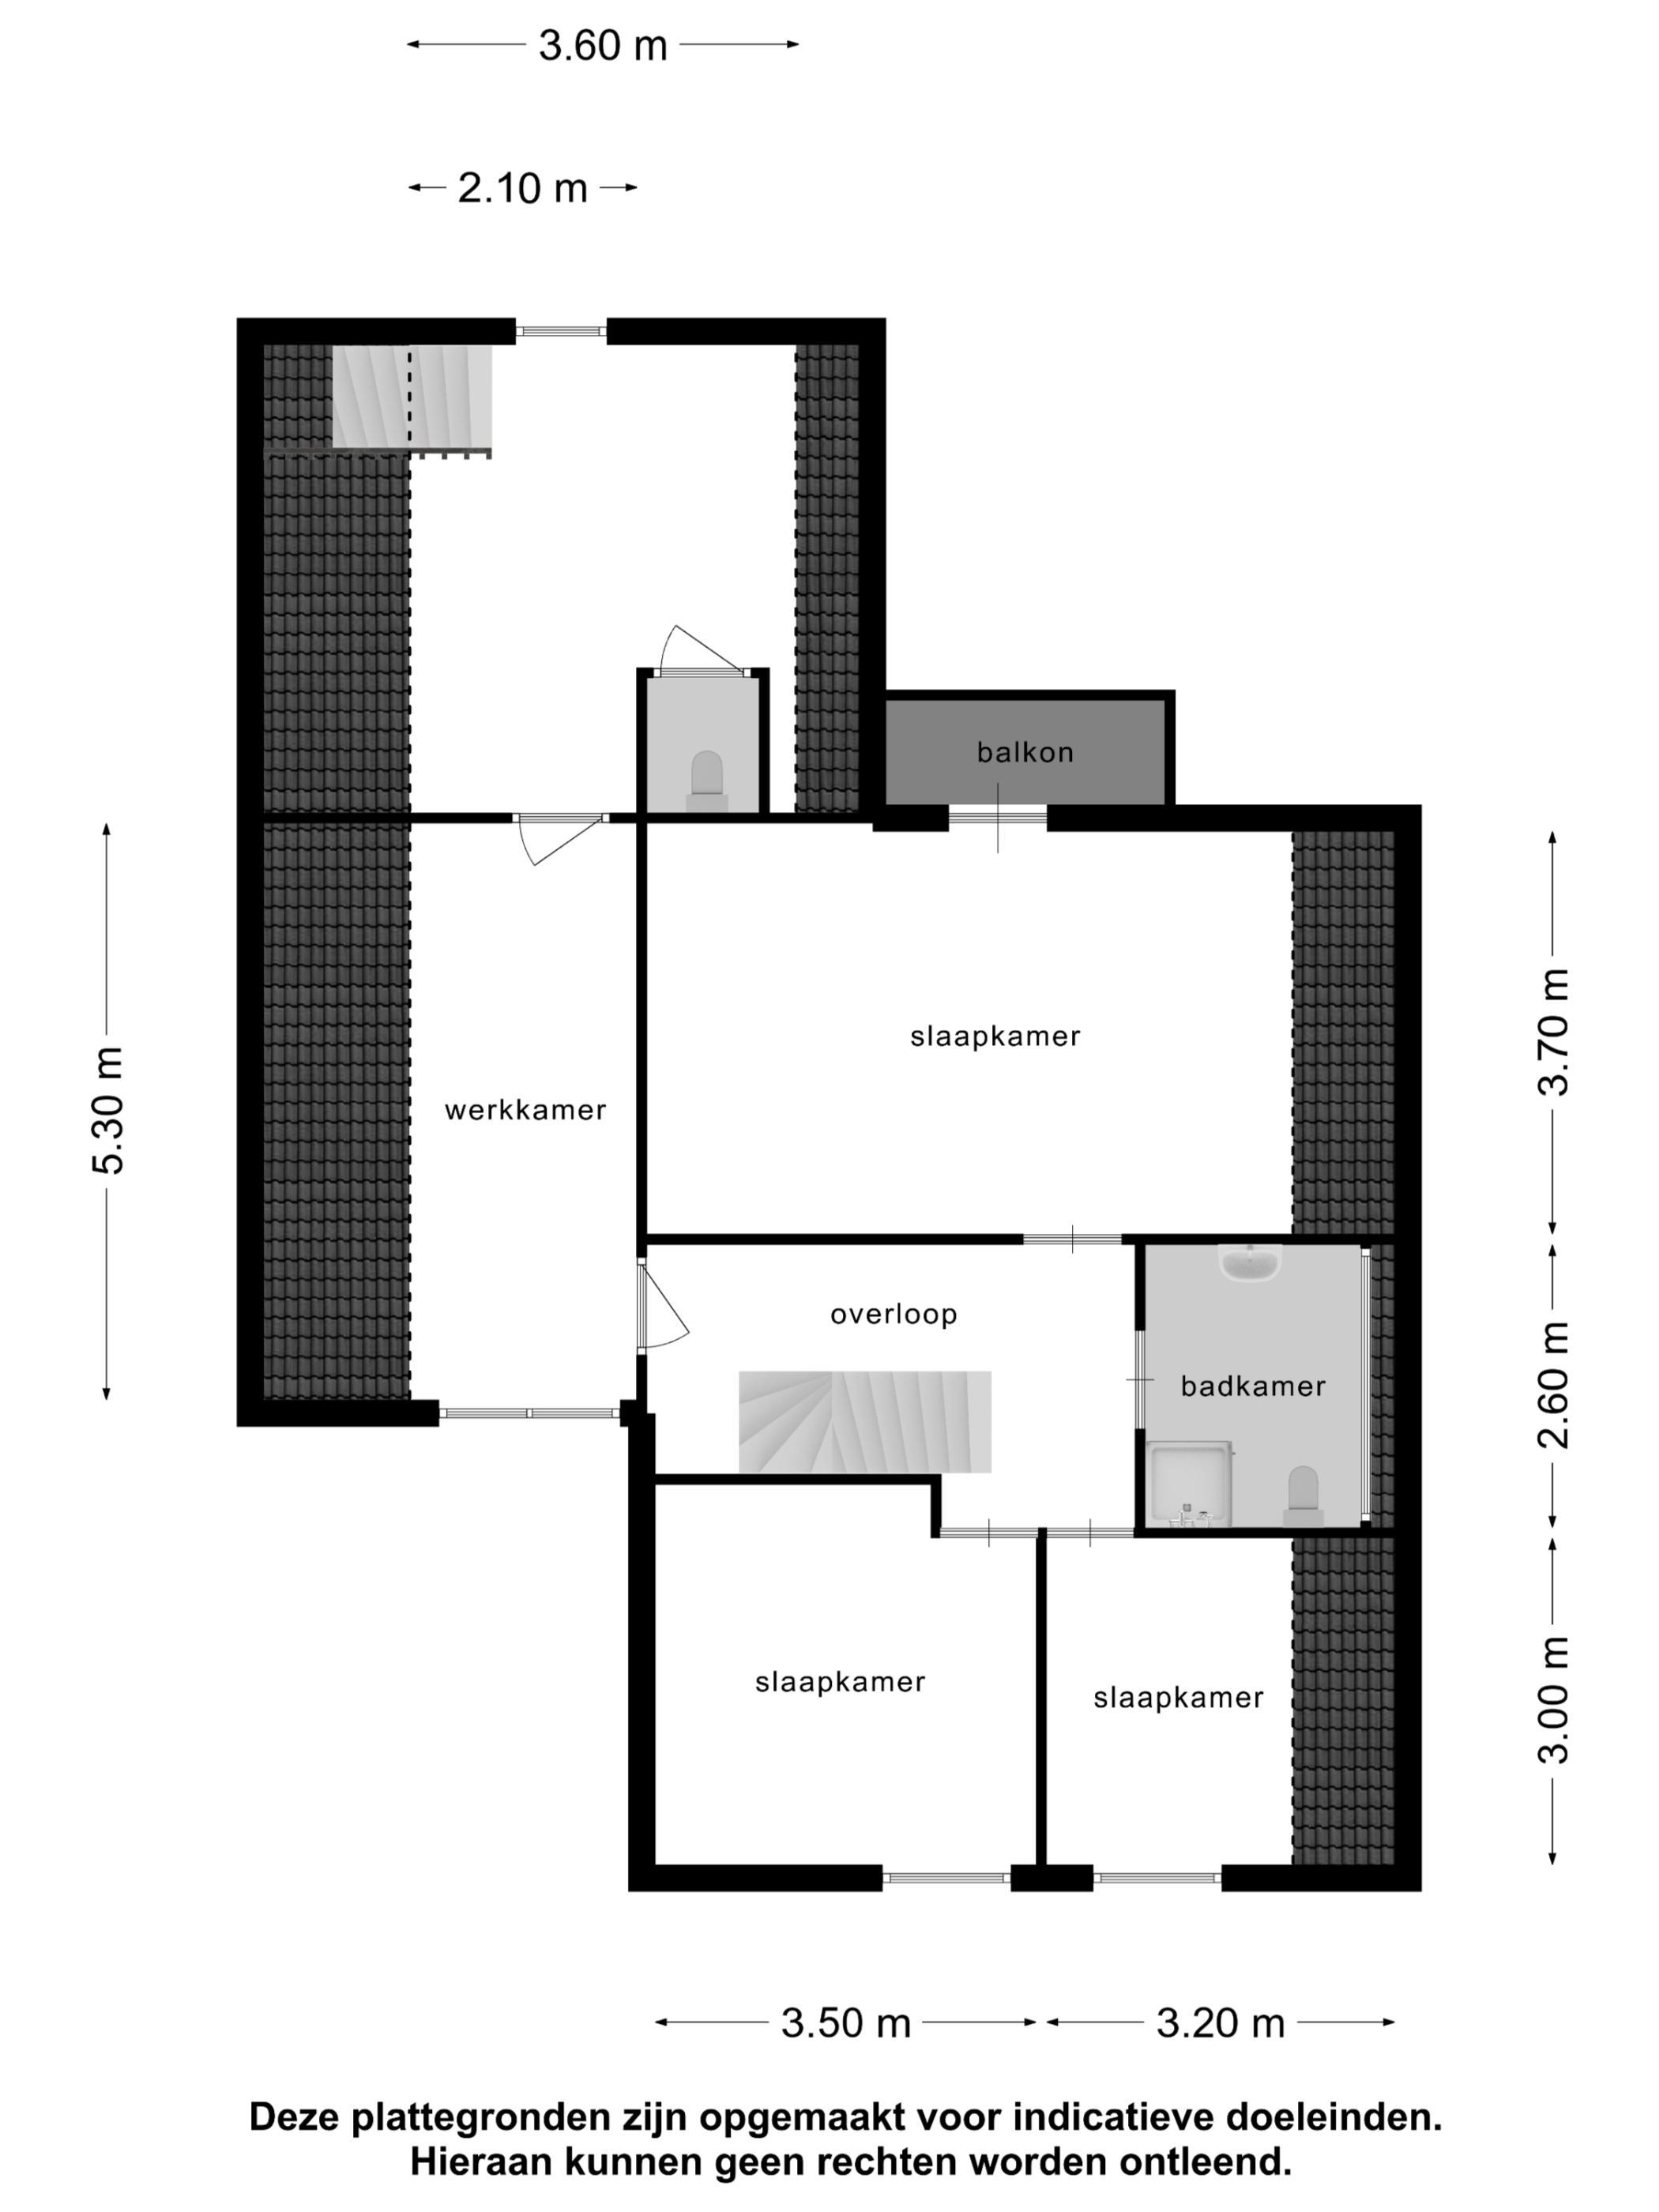 lantingawerf-7-ijlst-plattegrond-54